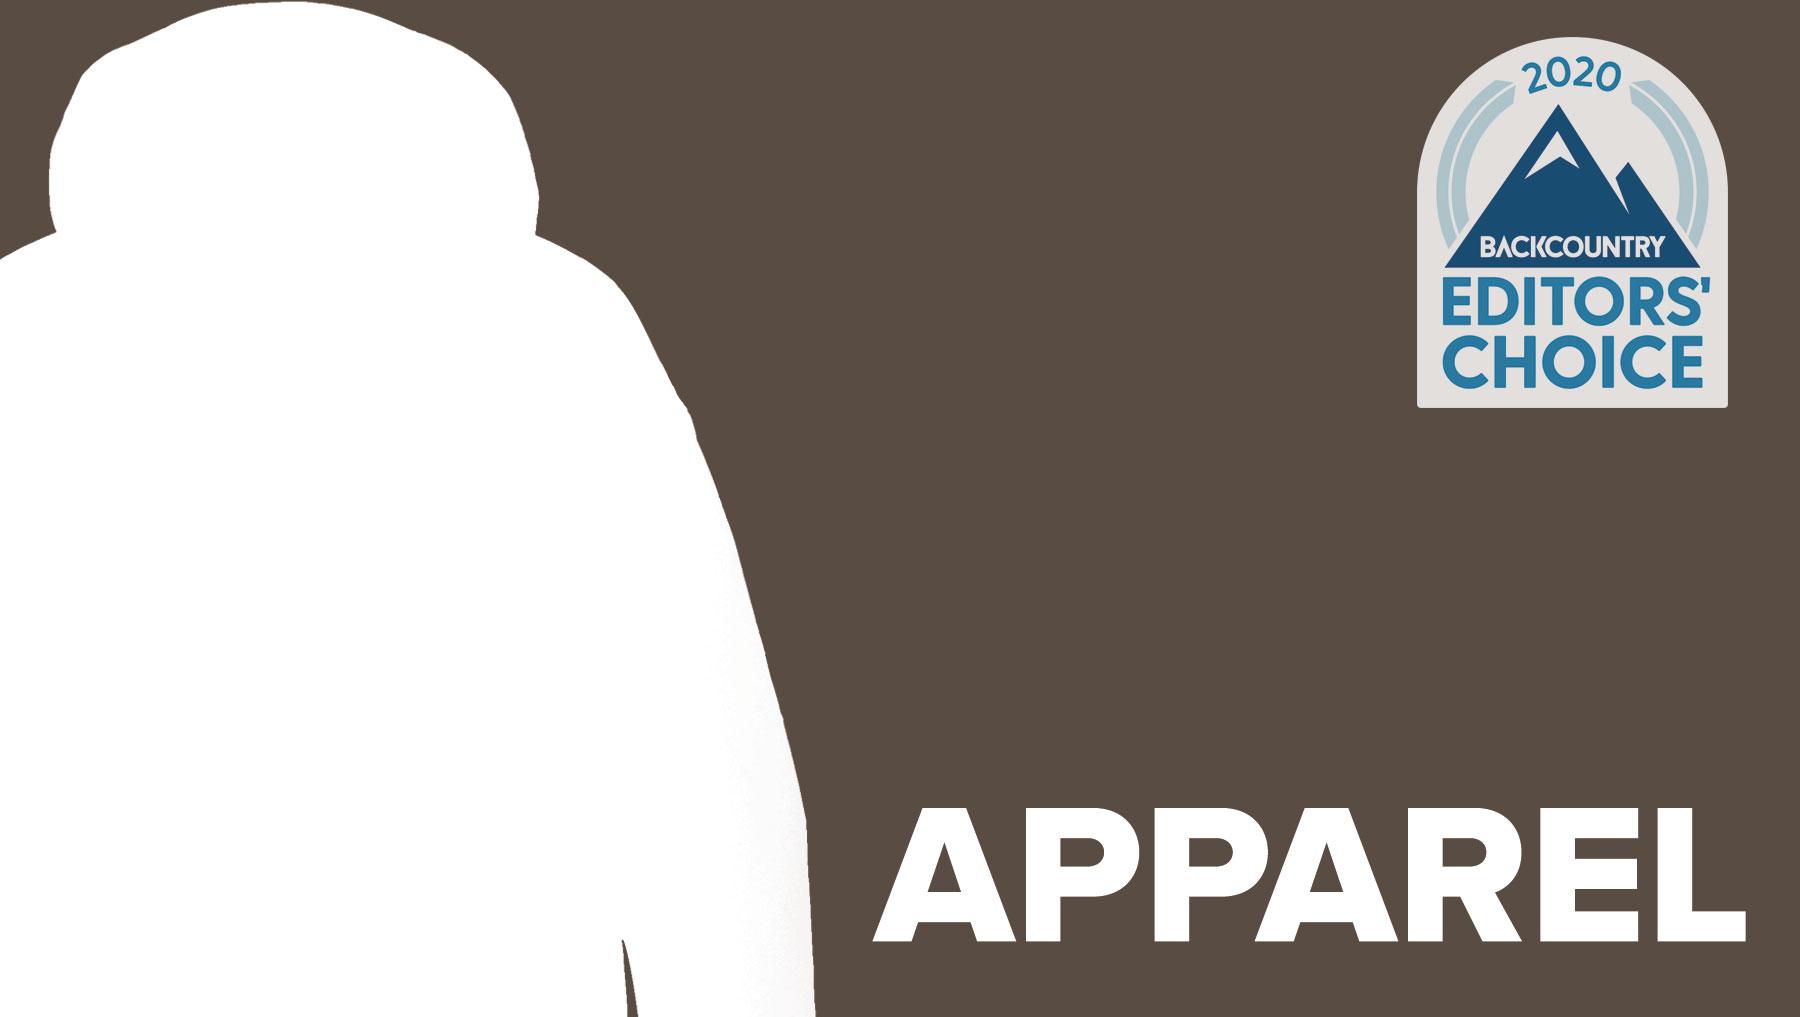 2020 Backcountry Editors Choice Apparel